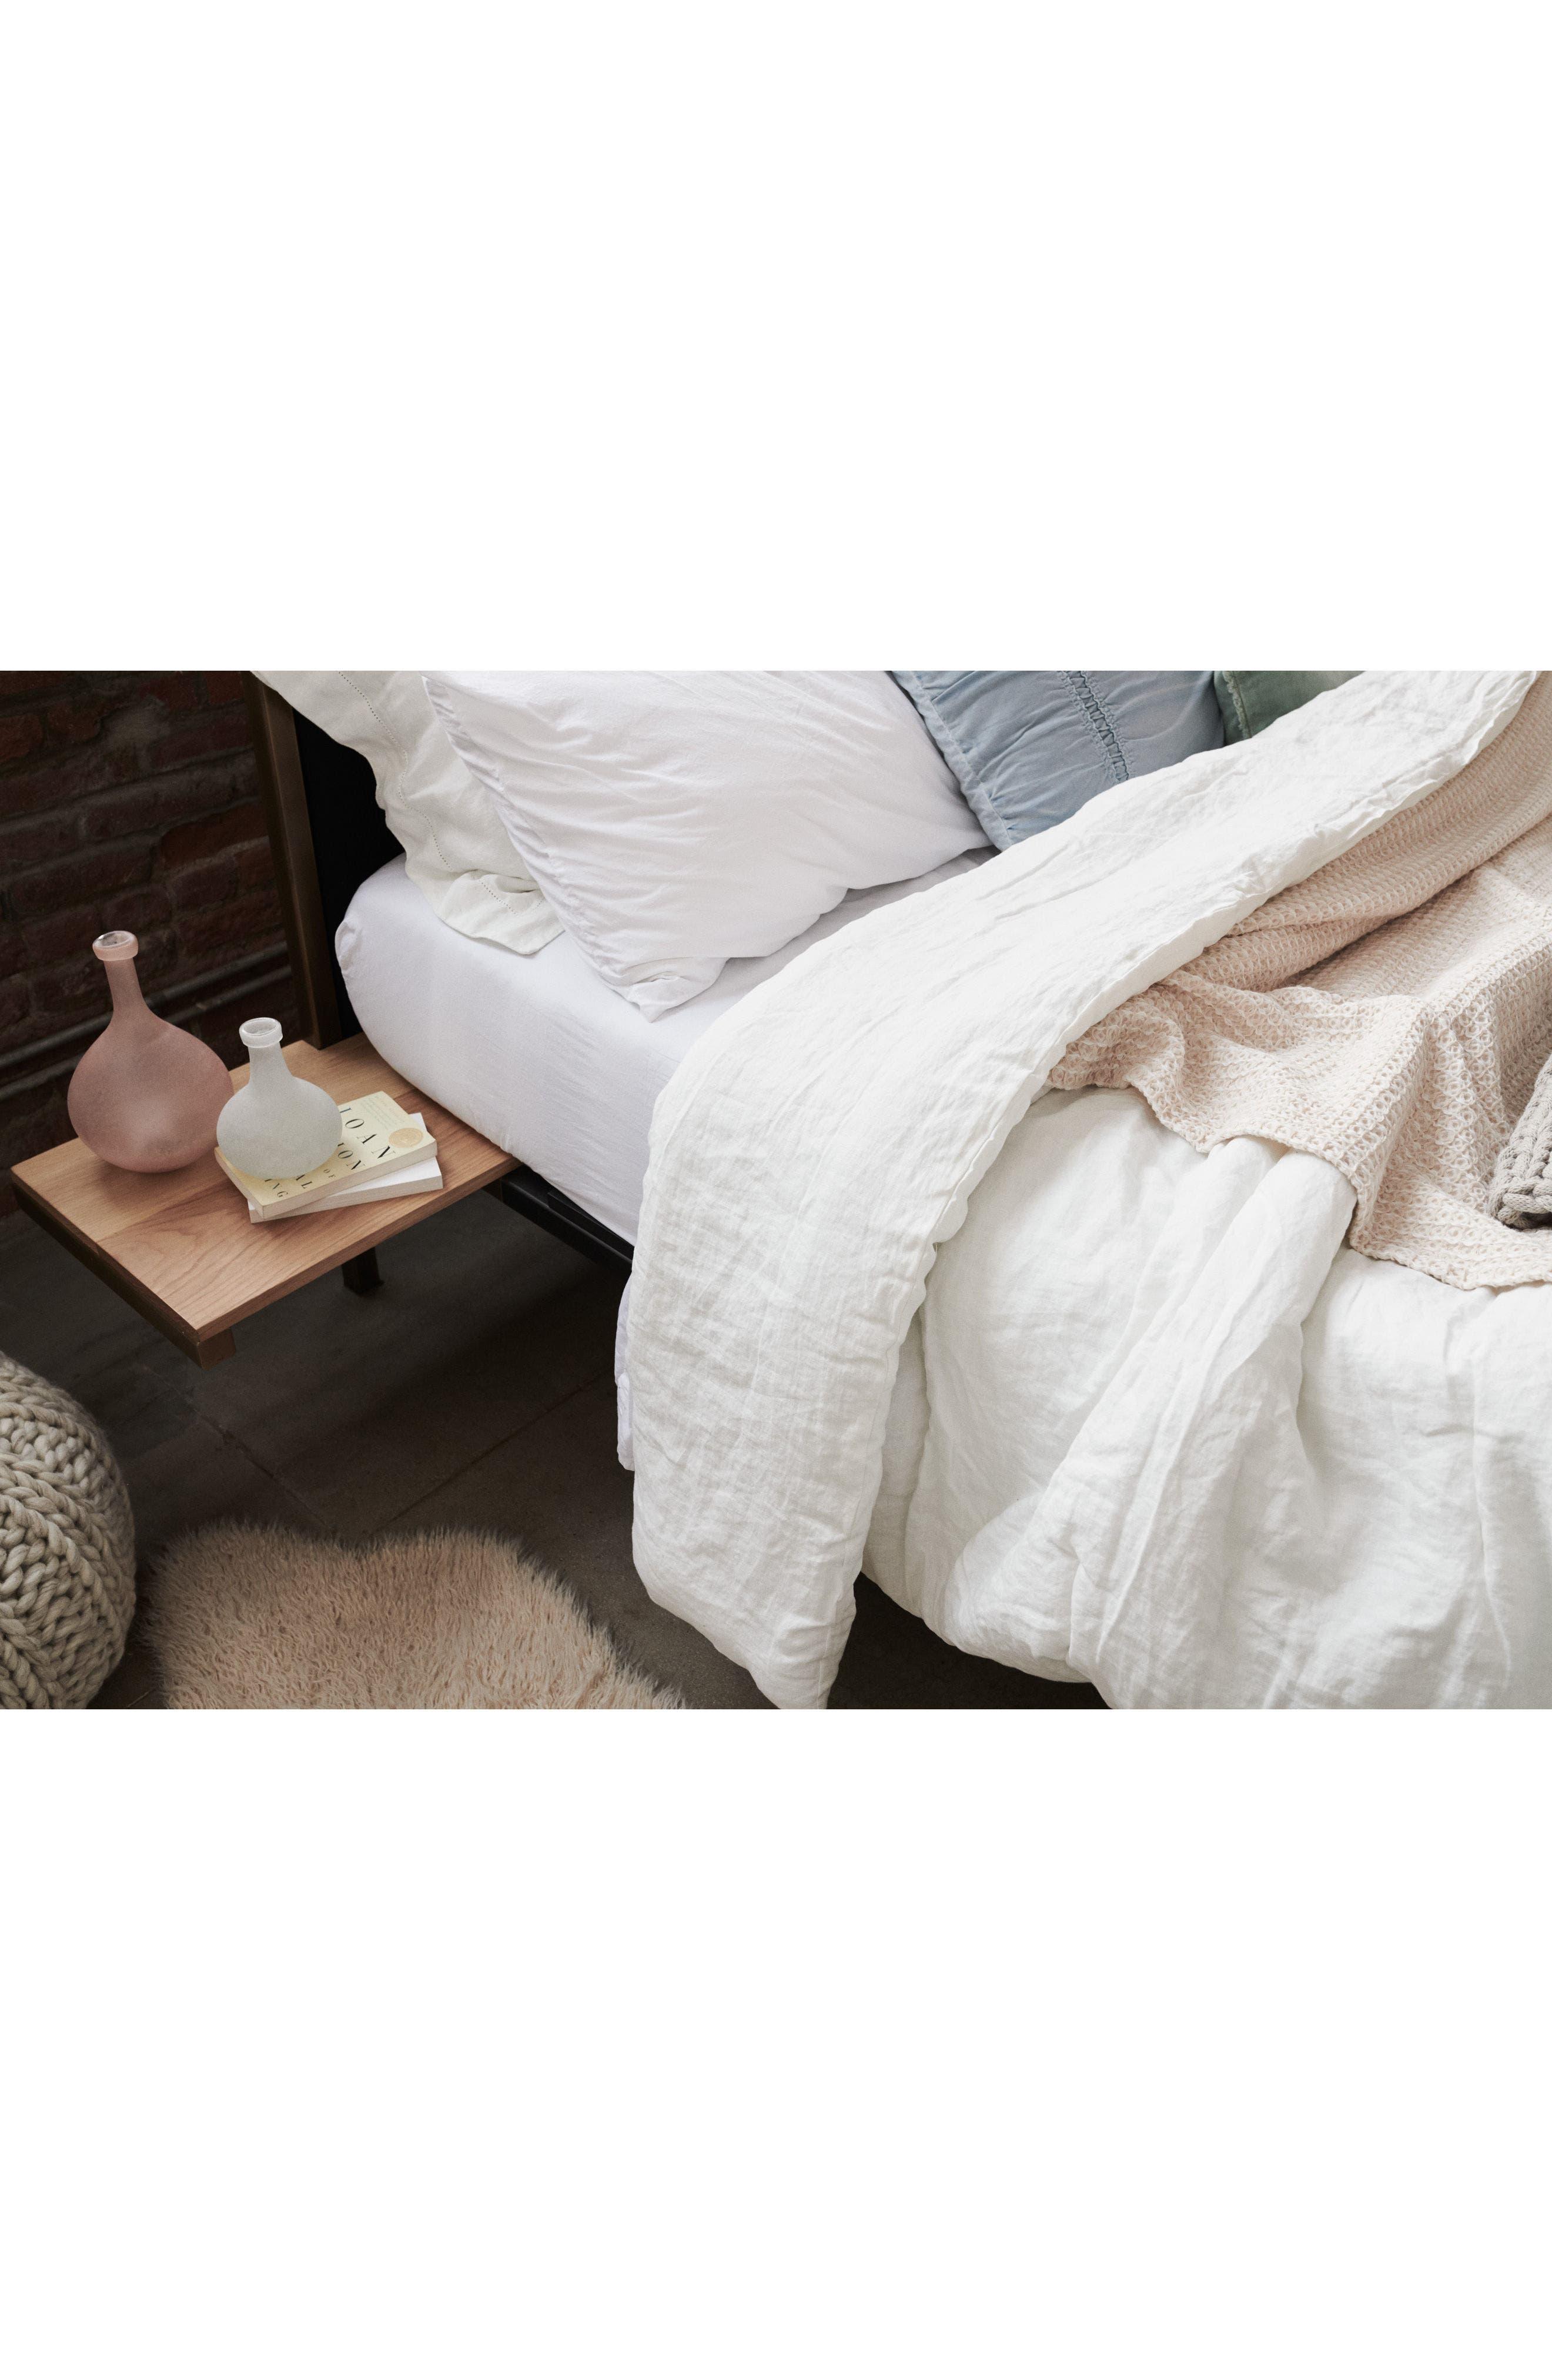 Relaxed Cotton & Linen Duvet Cover,                             Alternate thumbnail 7, color,                             OLIVE SPICE